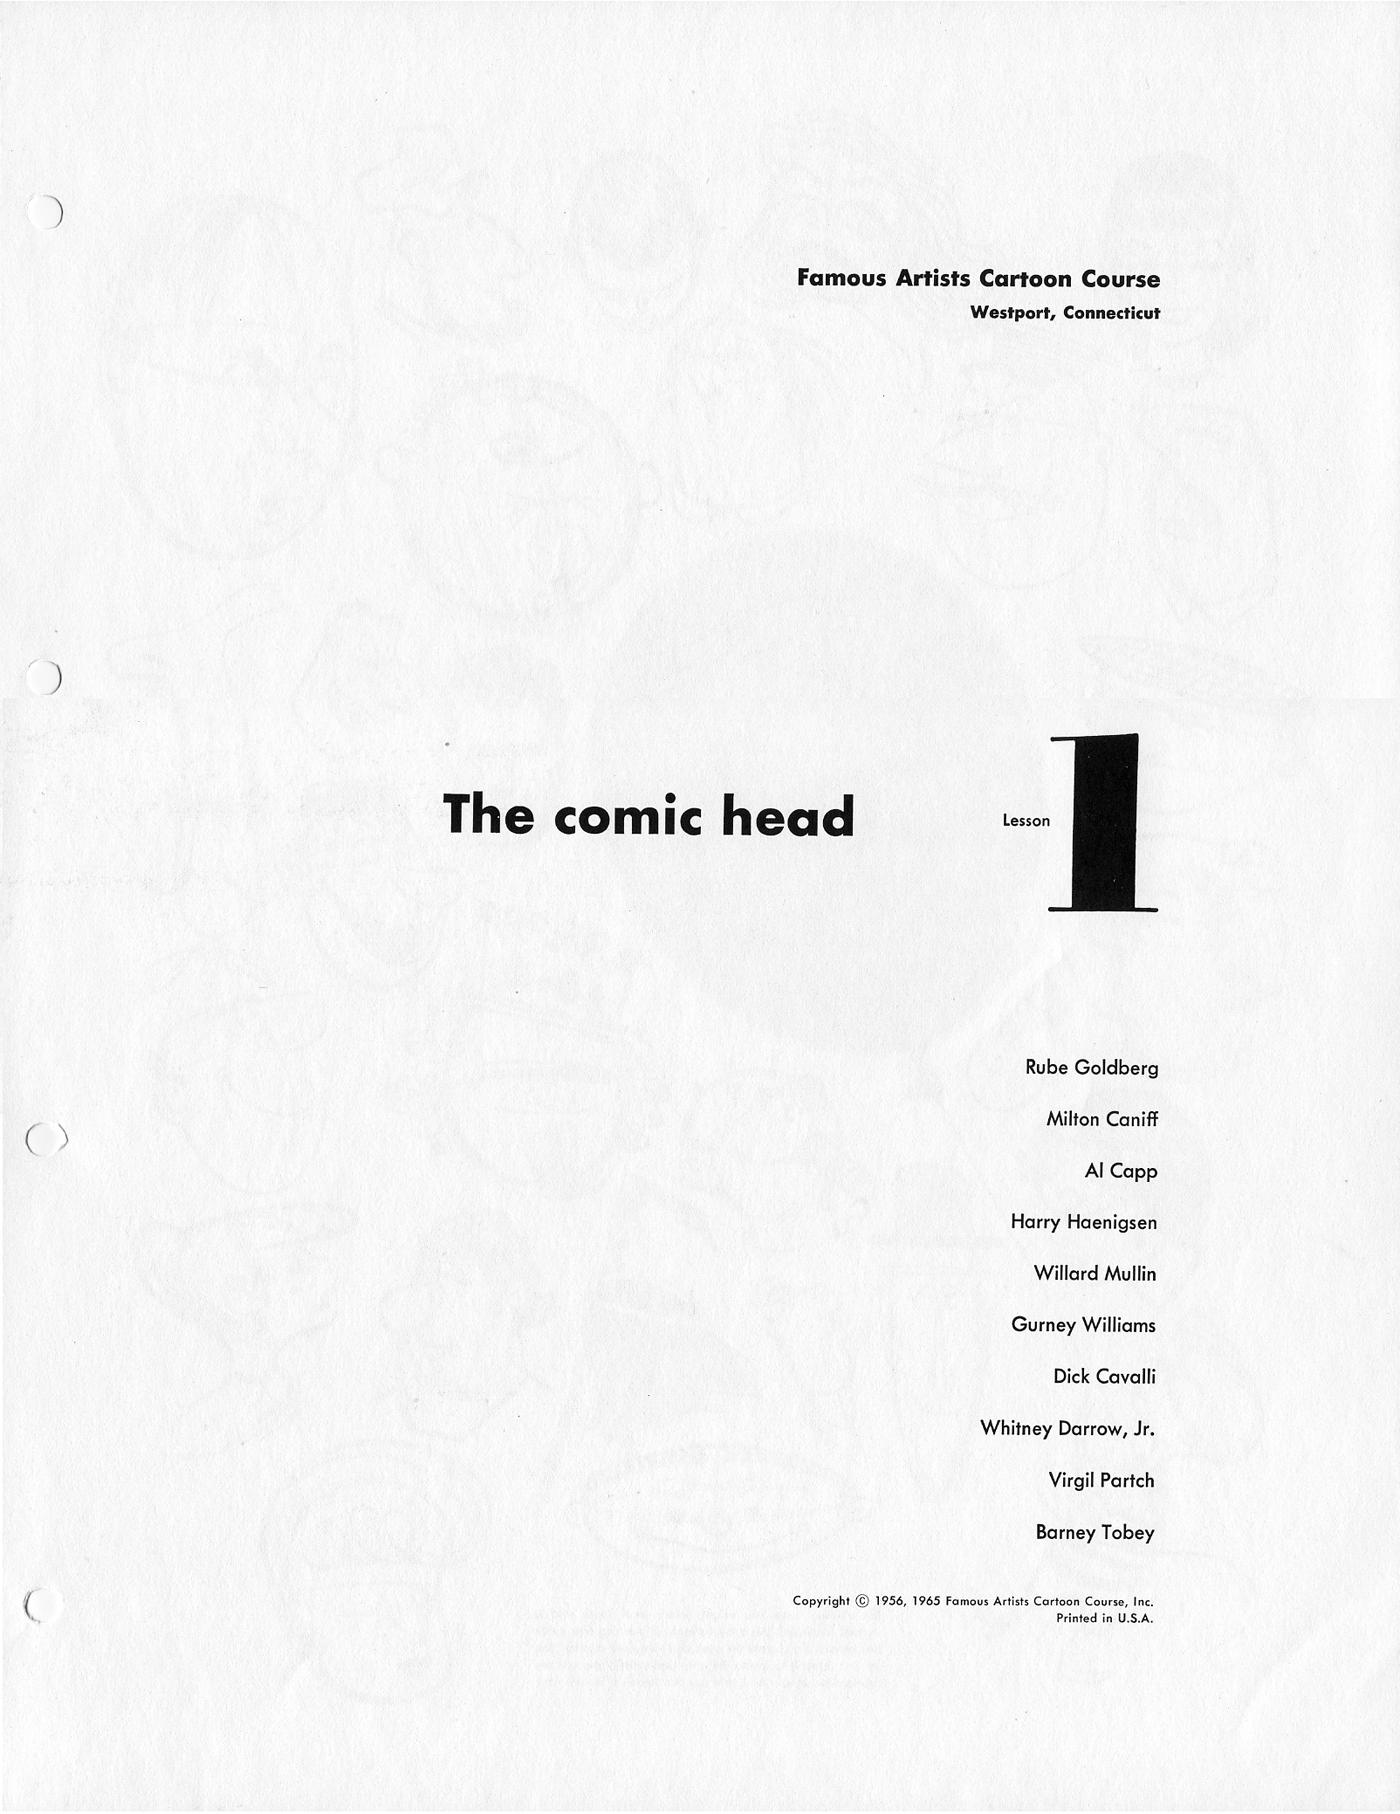 Ch1: The Comic Head (FACC)